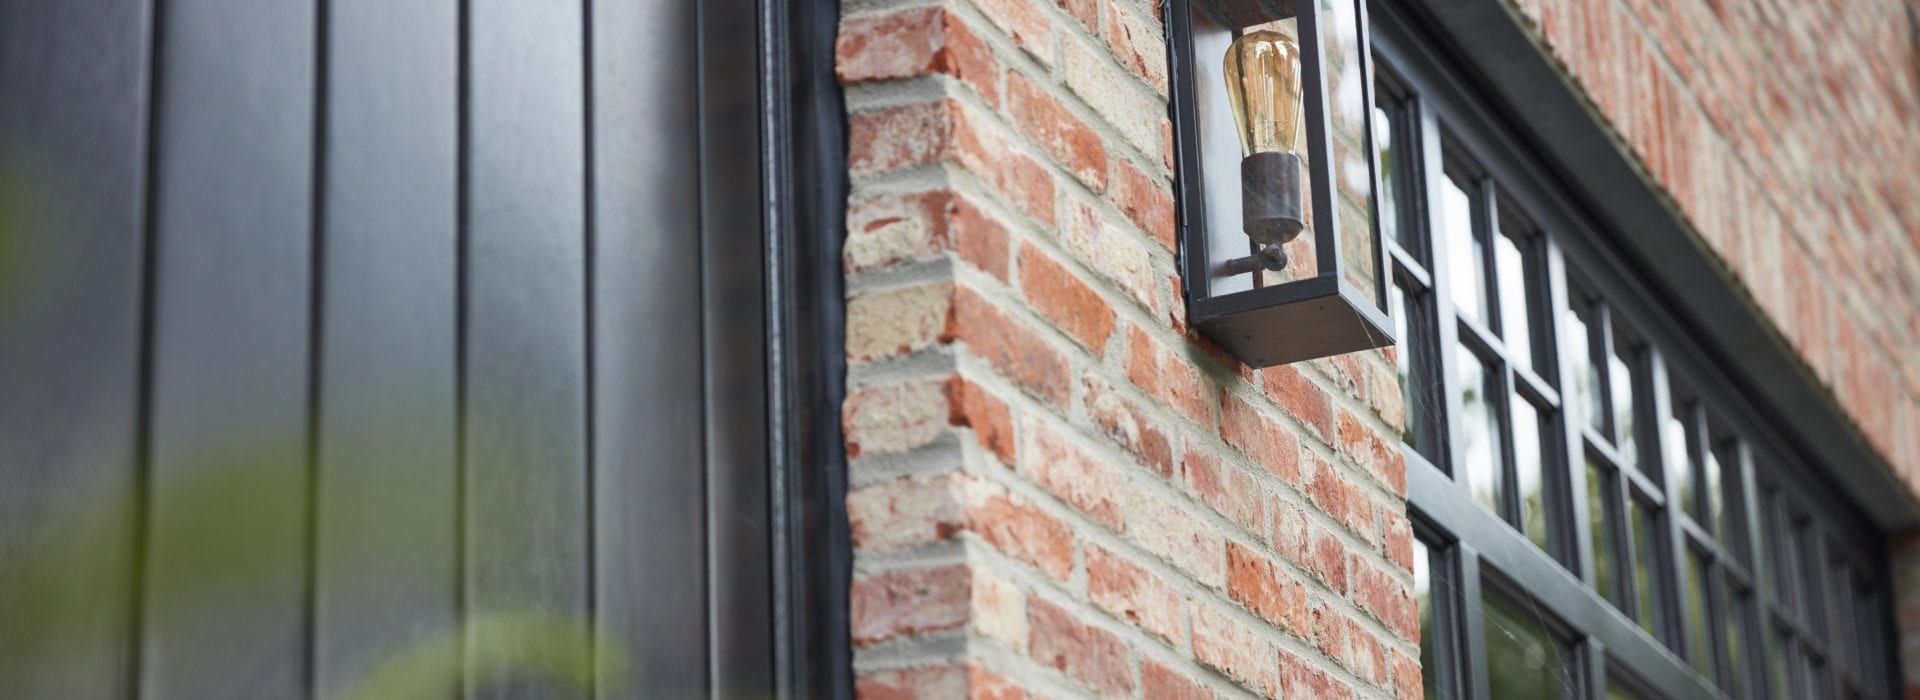 Uw eigen woning bouwen in 7 stappen